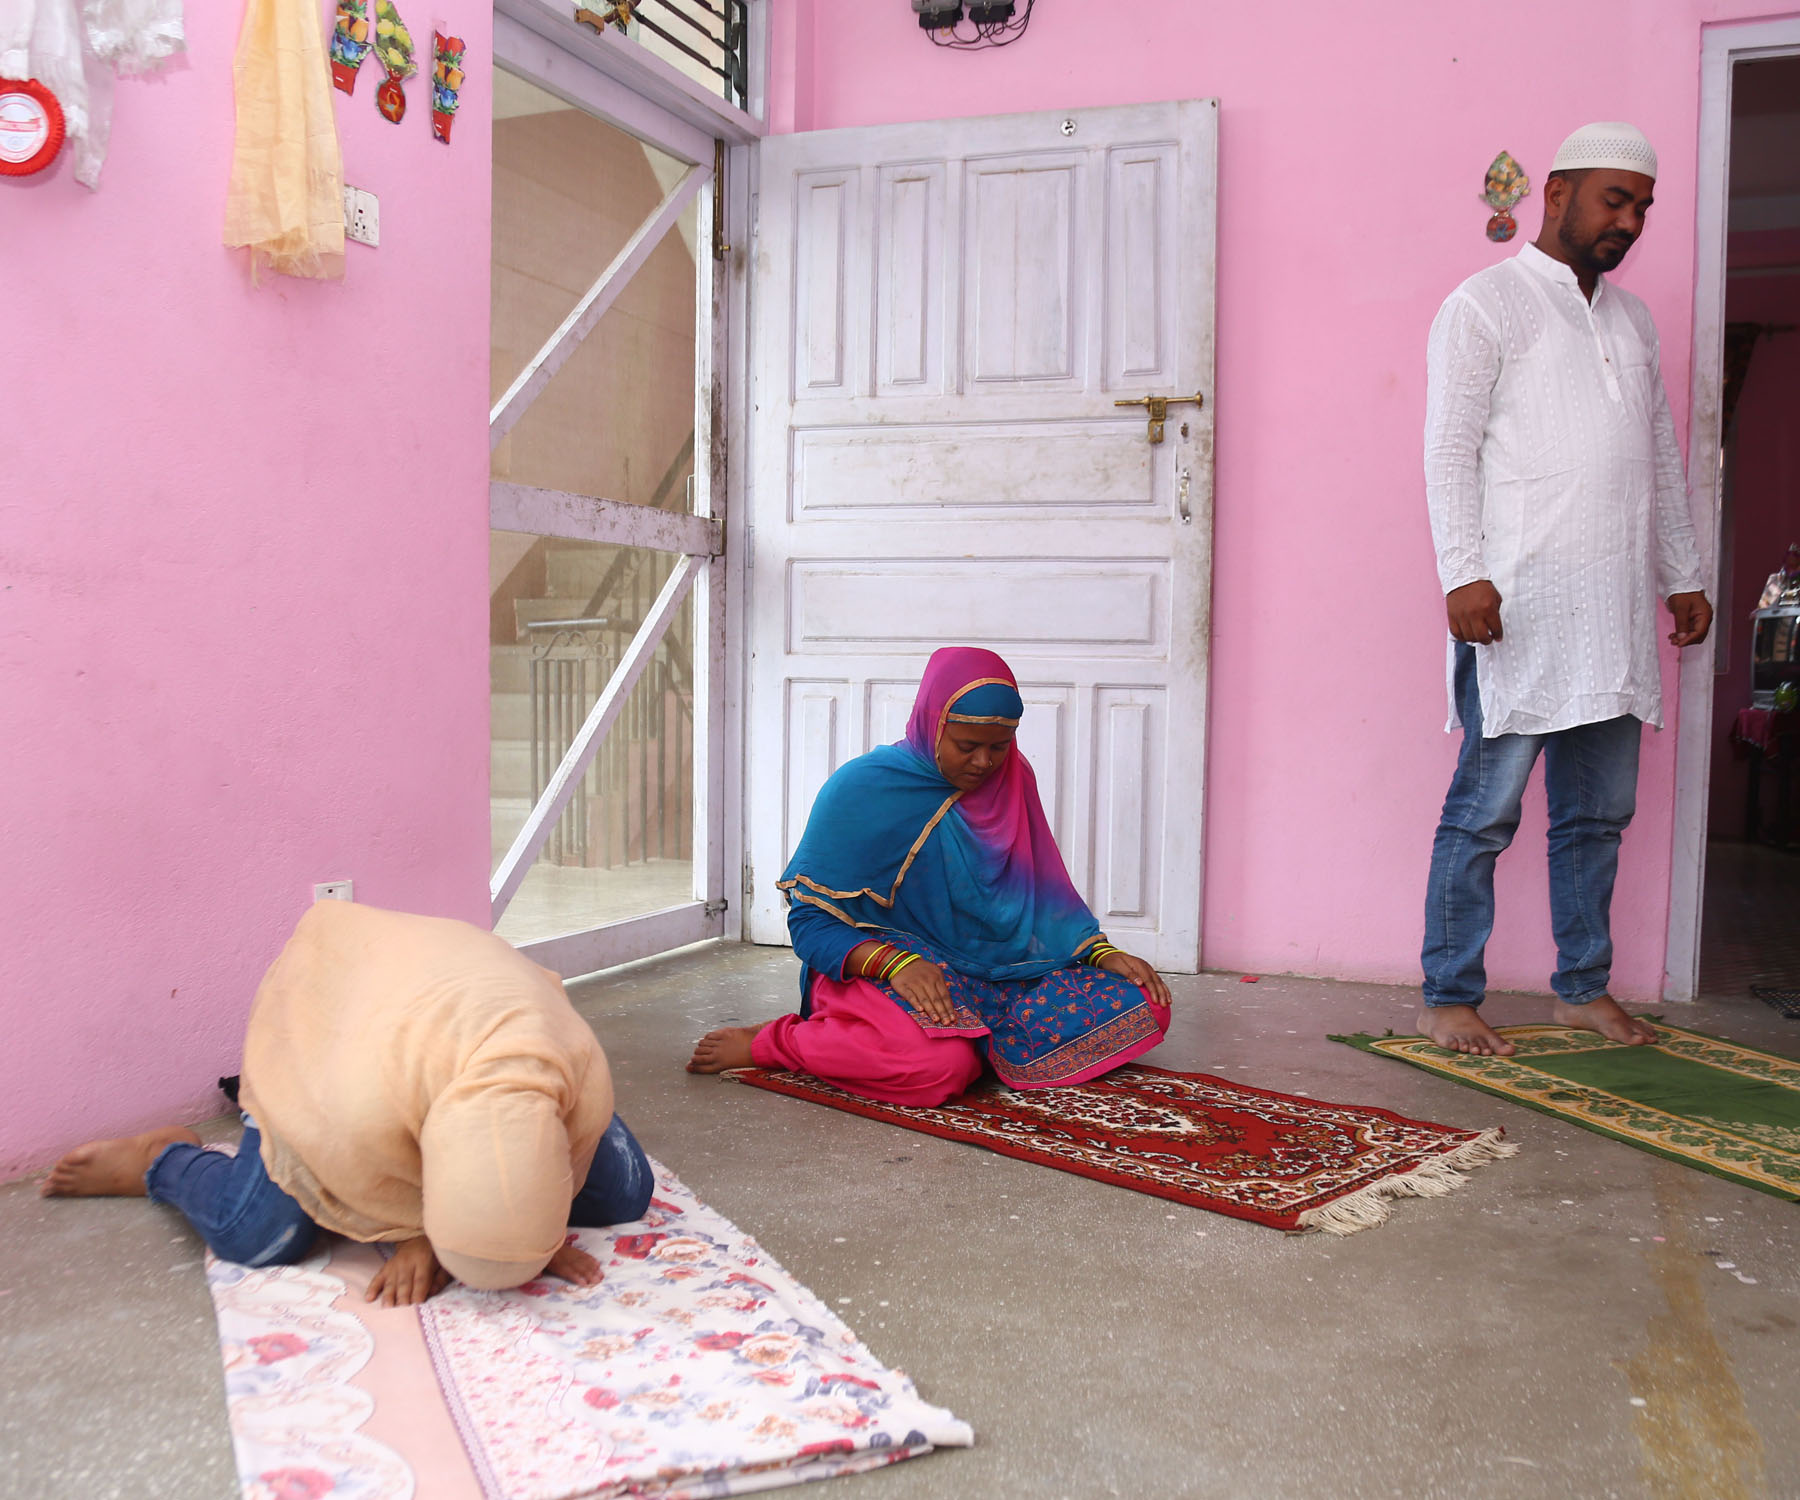 मुस्लिम धर्मावलम्बीले मनाए बकर ईद (इदुल जोहा)